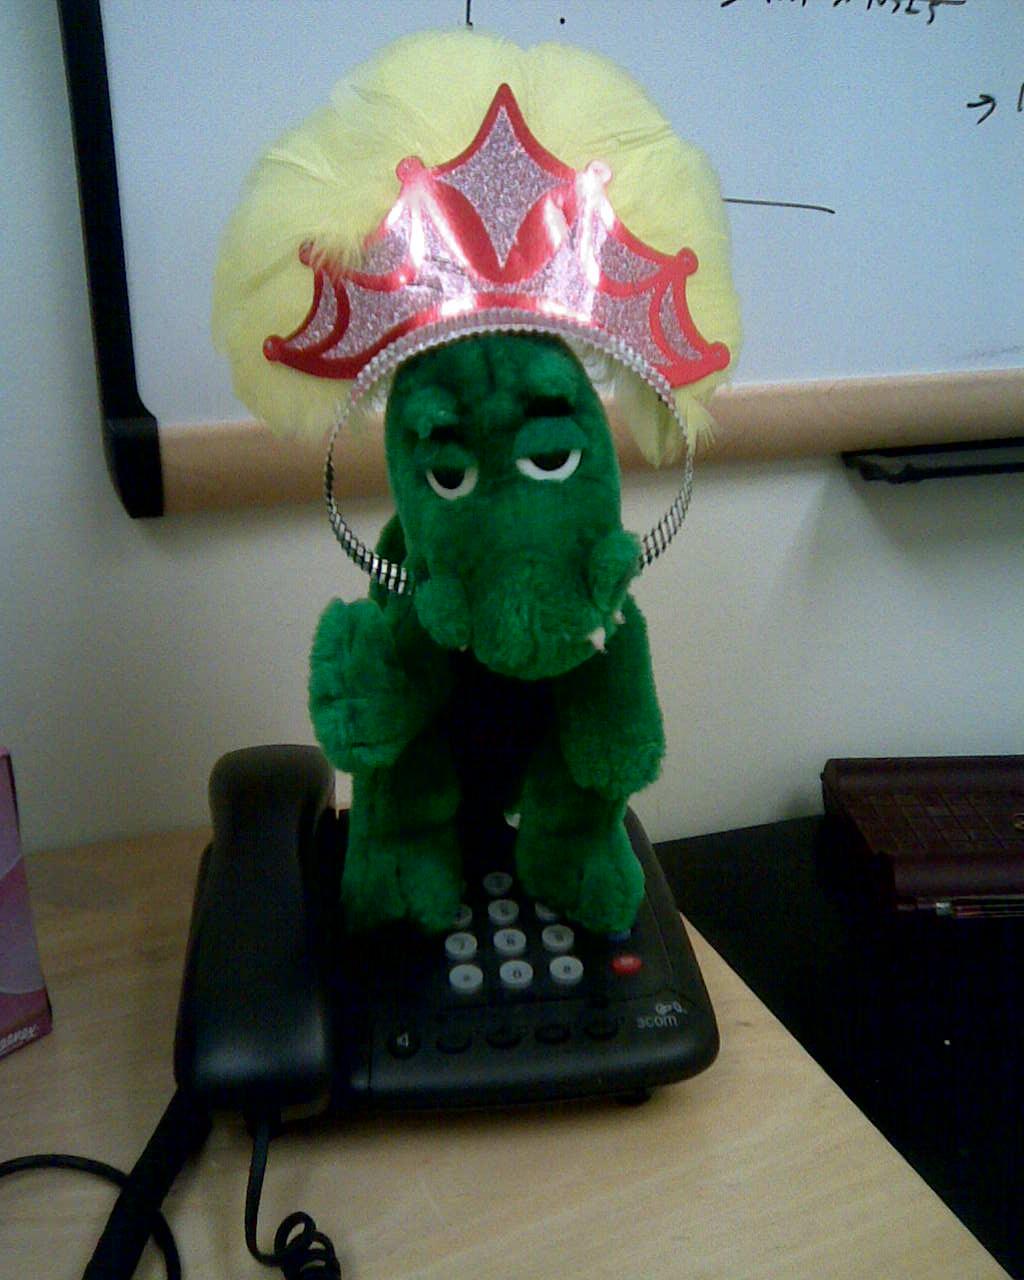 Princess Mozilla on the phone